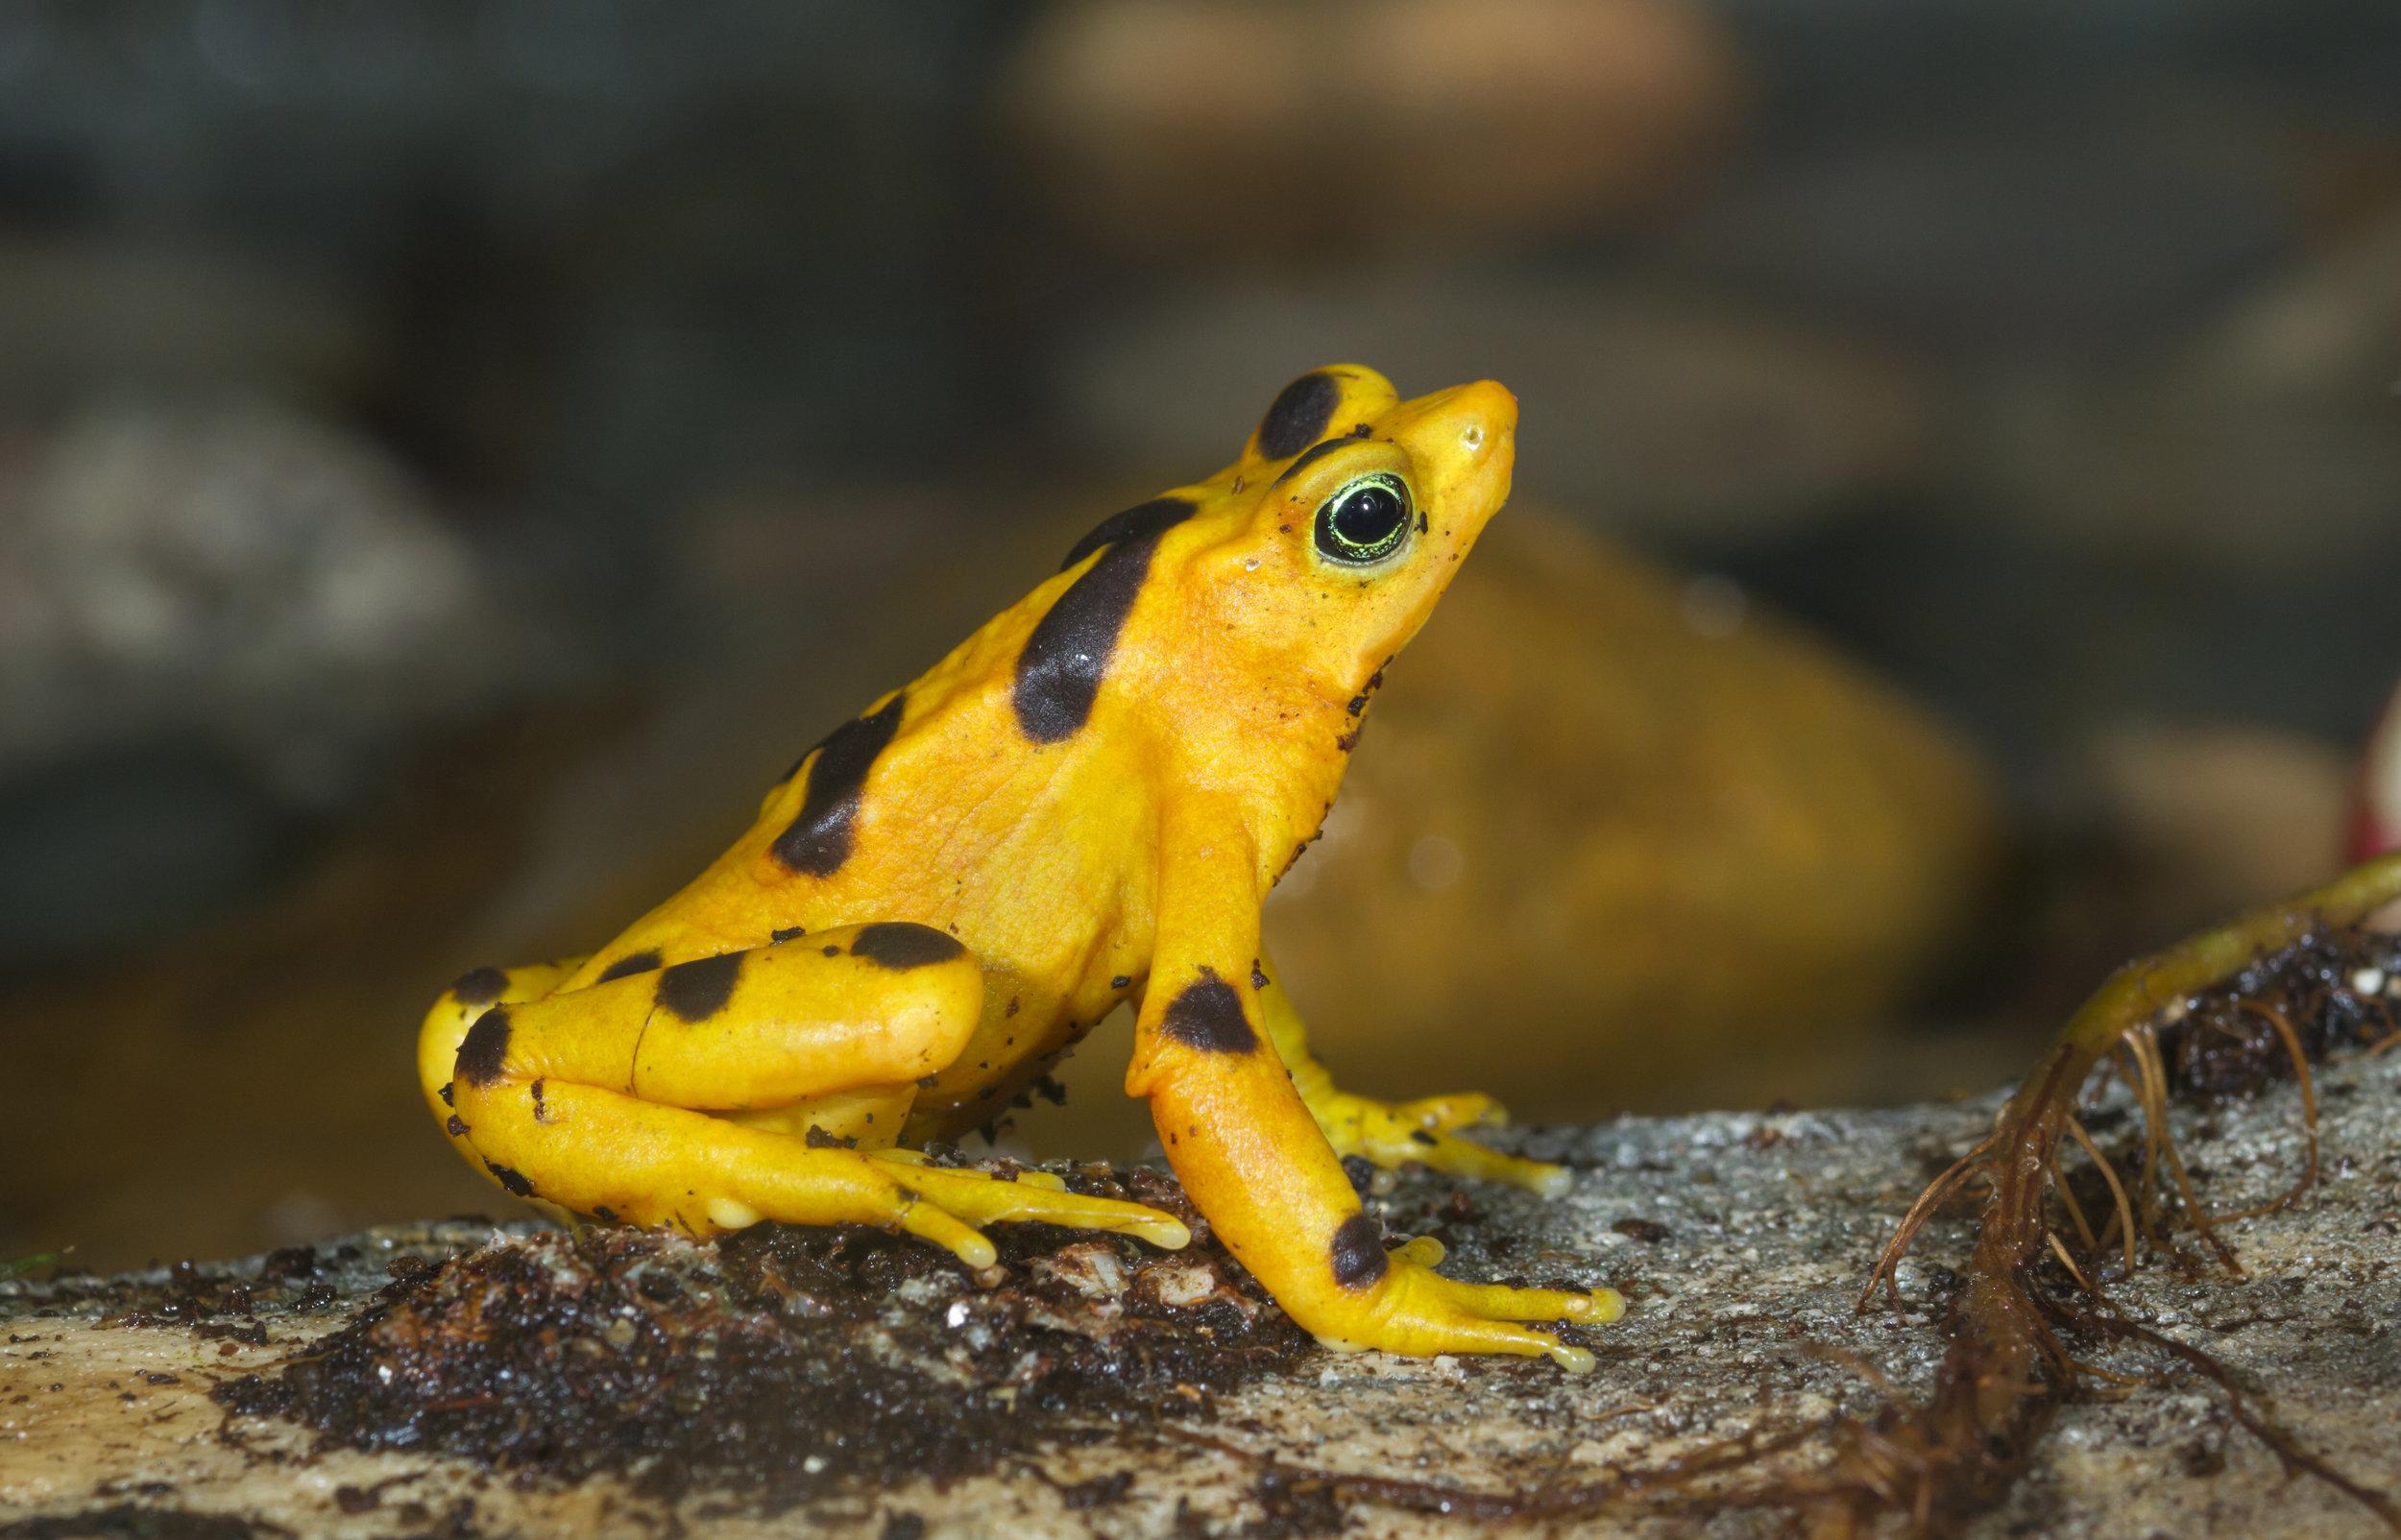 Endangered Panamanian Zetek's golden frog (Atelopus zeteki), captive (native to cloud forests of Panama, Central America).